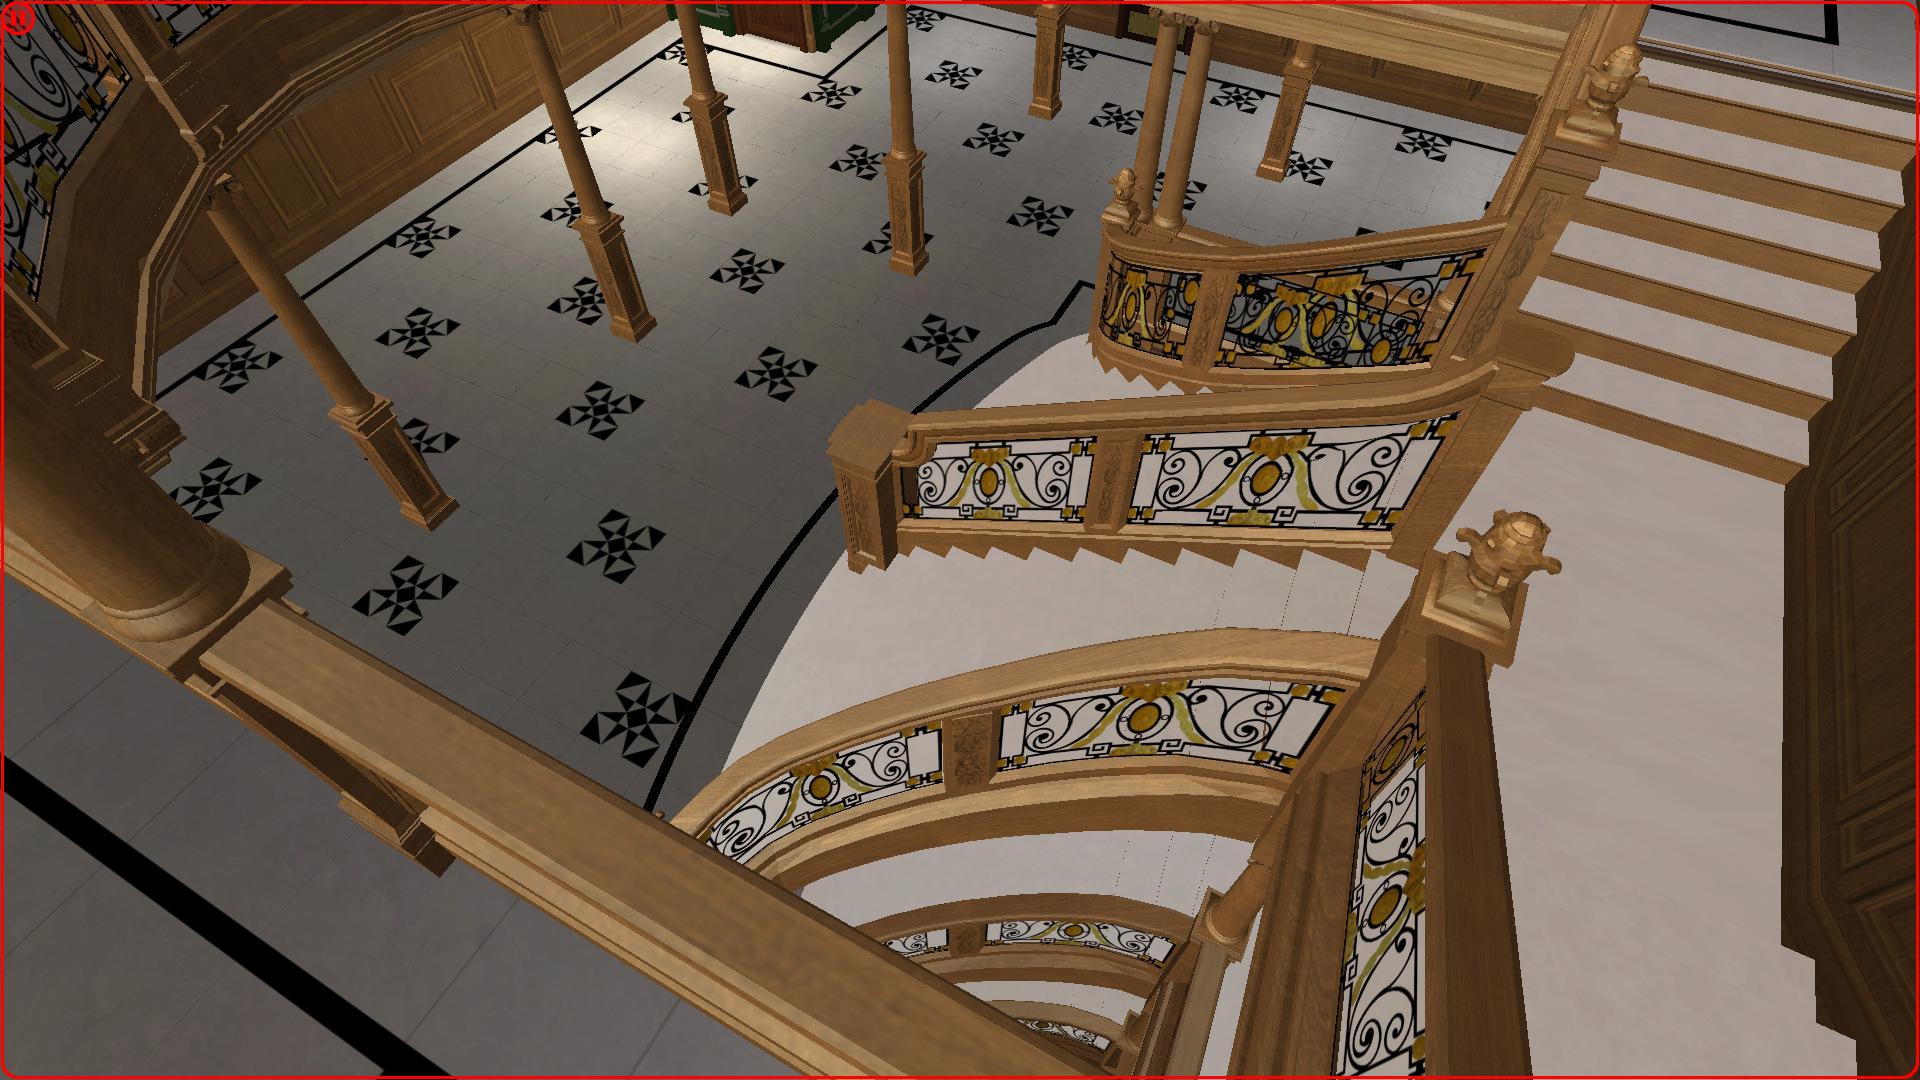 The Sims 2 Titanic Sims2e43